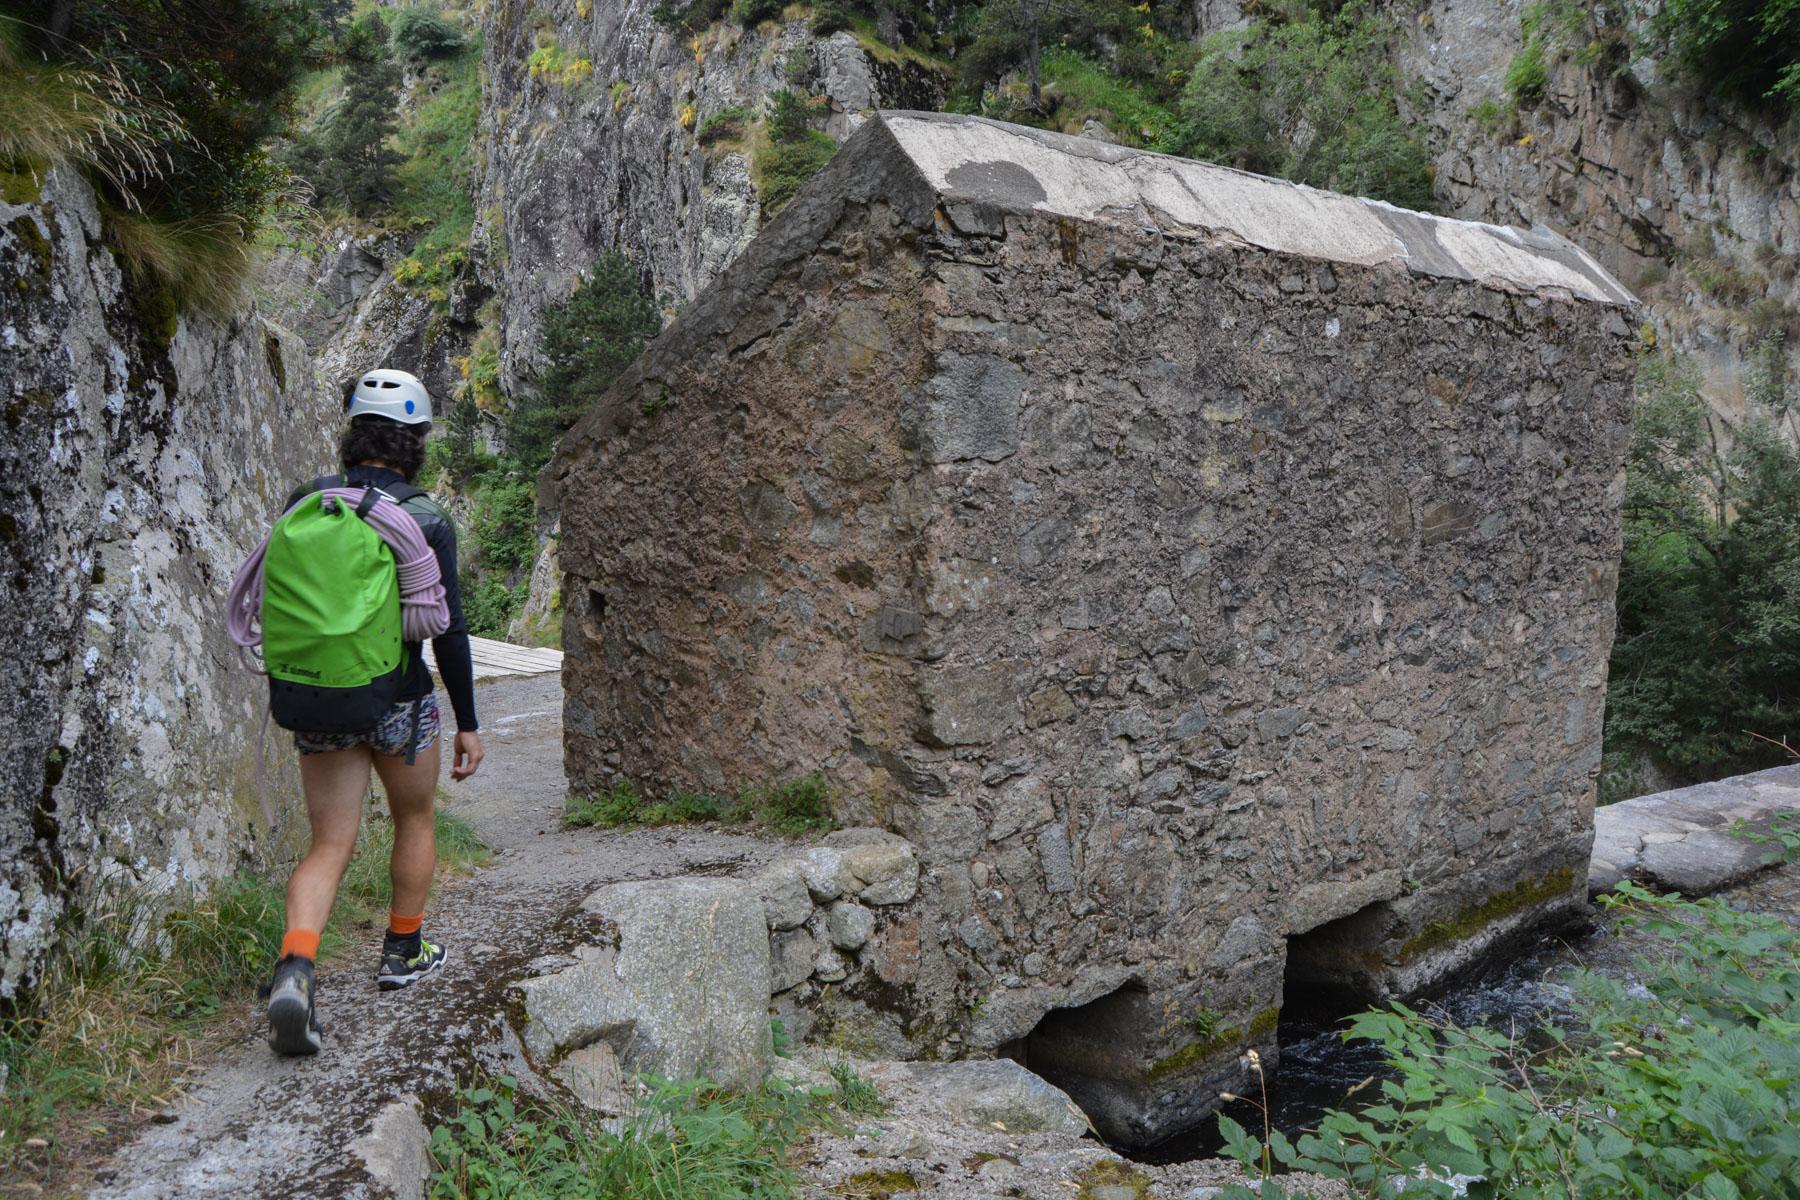 Gorges de Nuria, Catalunya 9